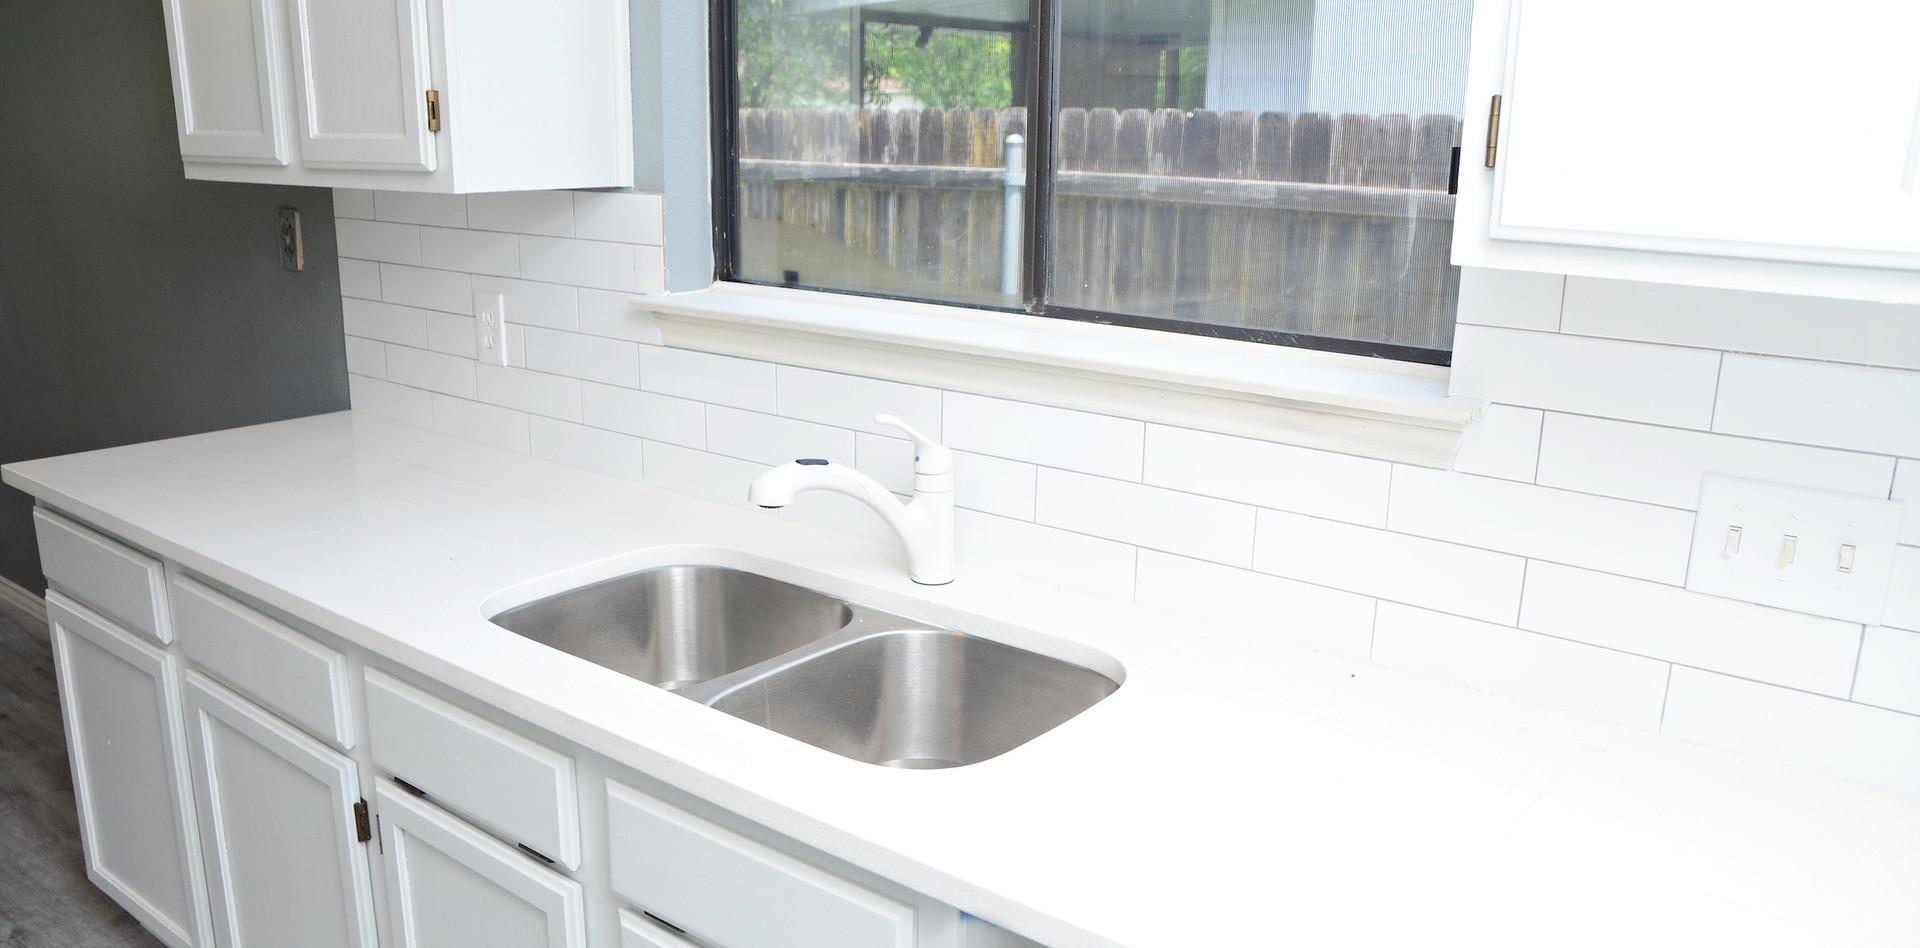 kitchen_remodel_7.JPG